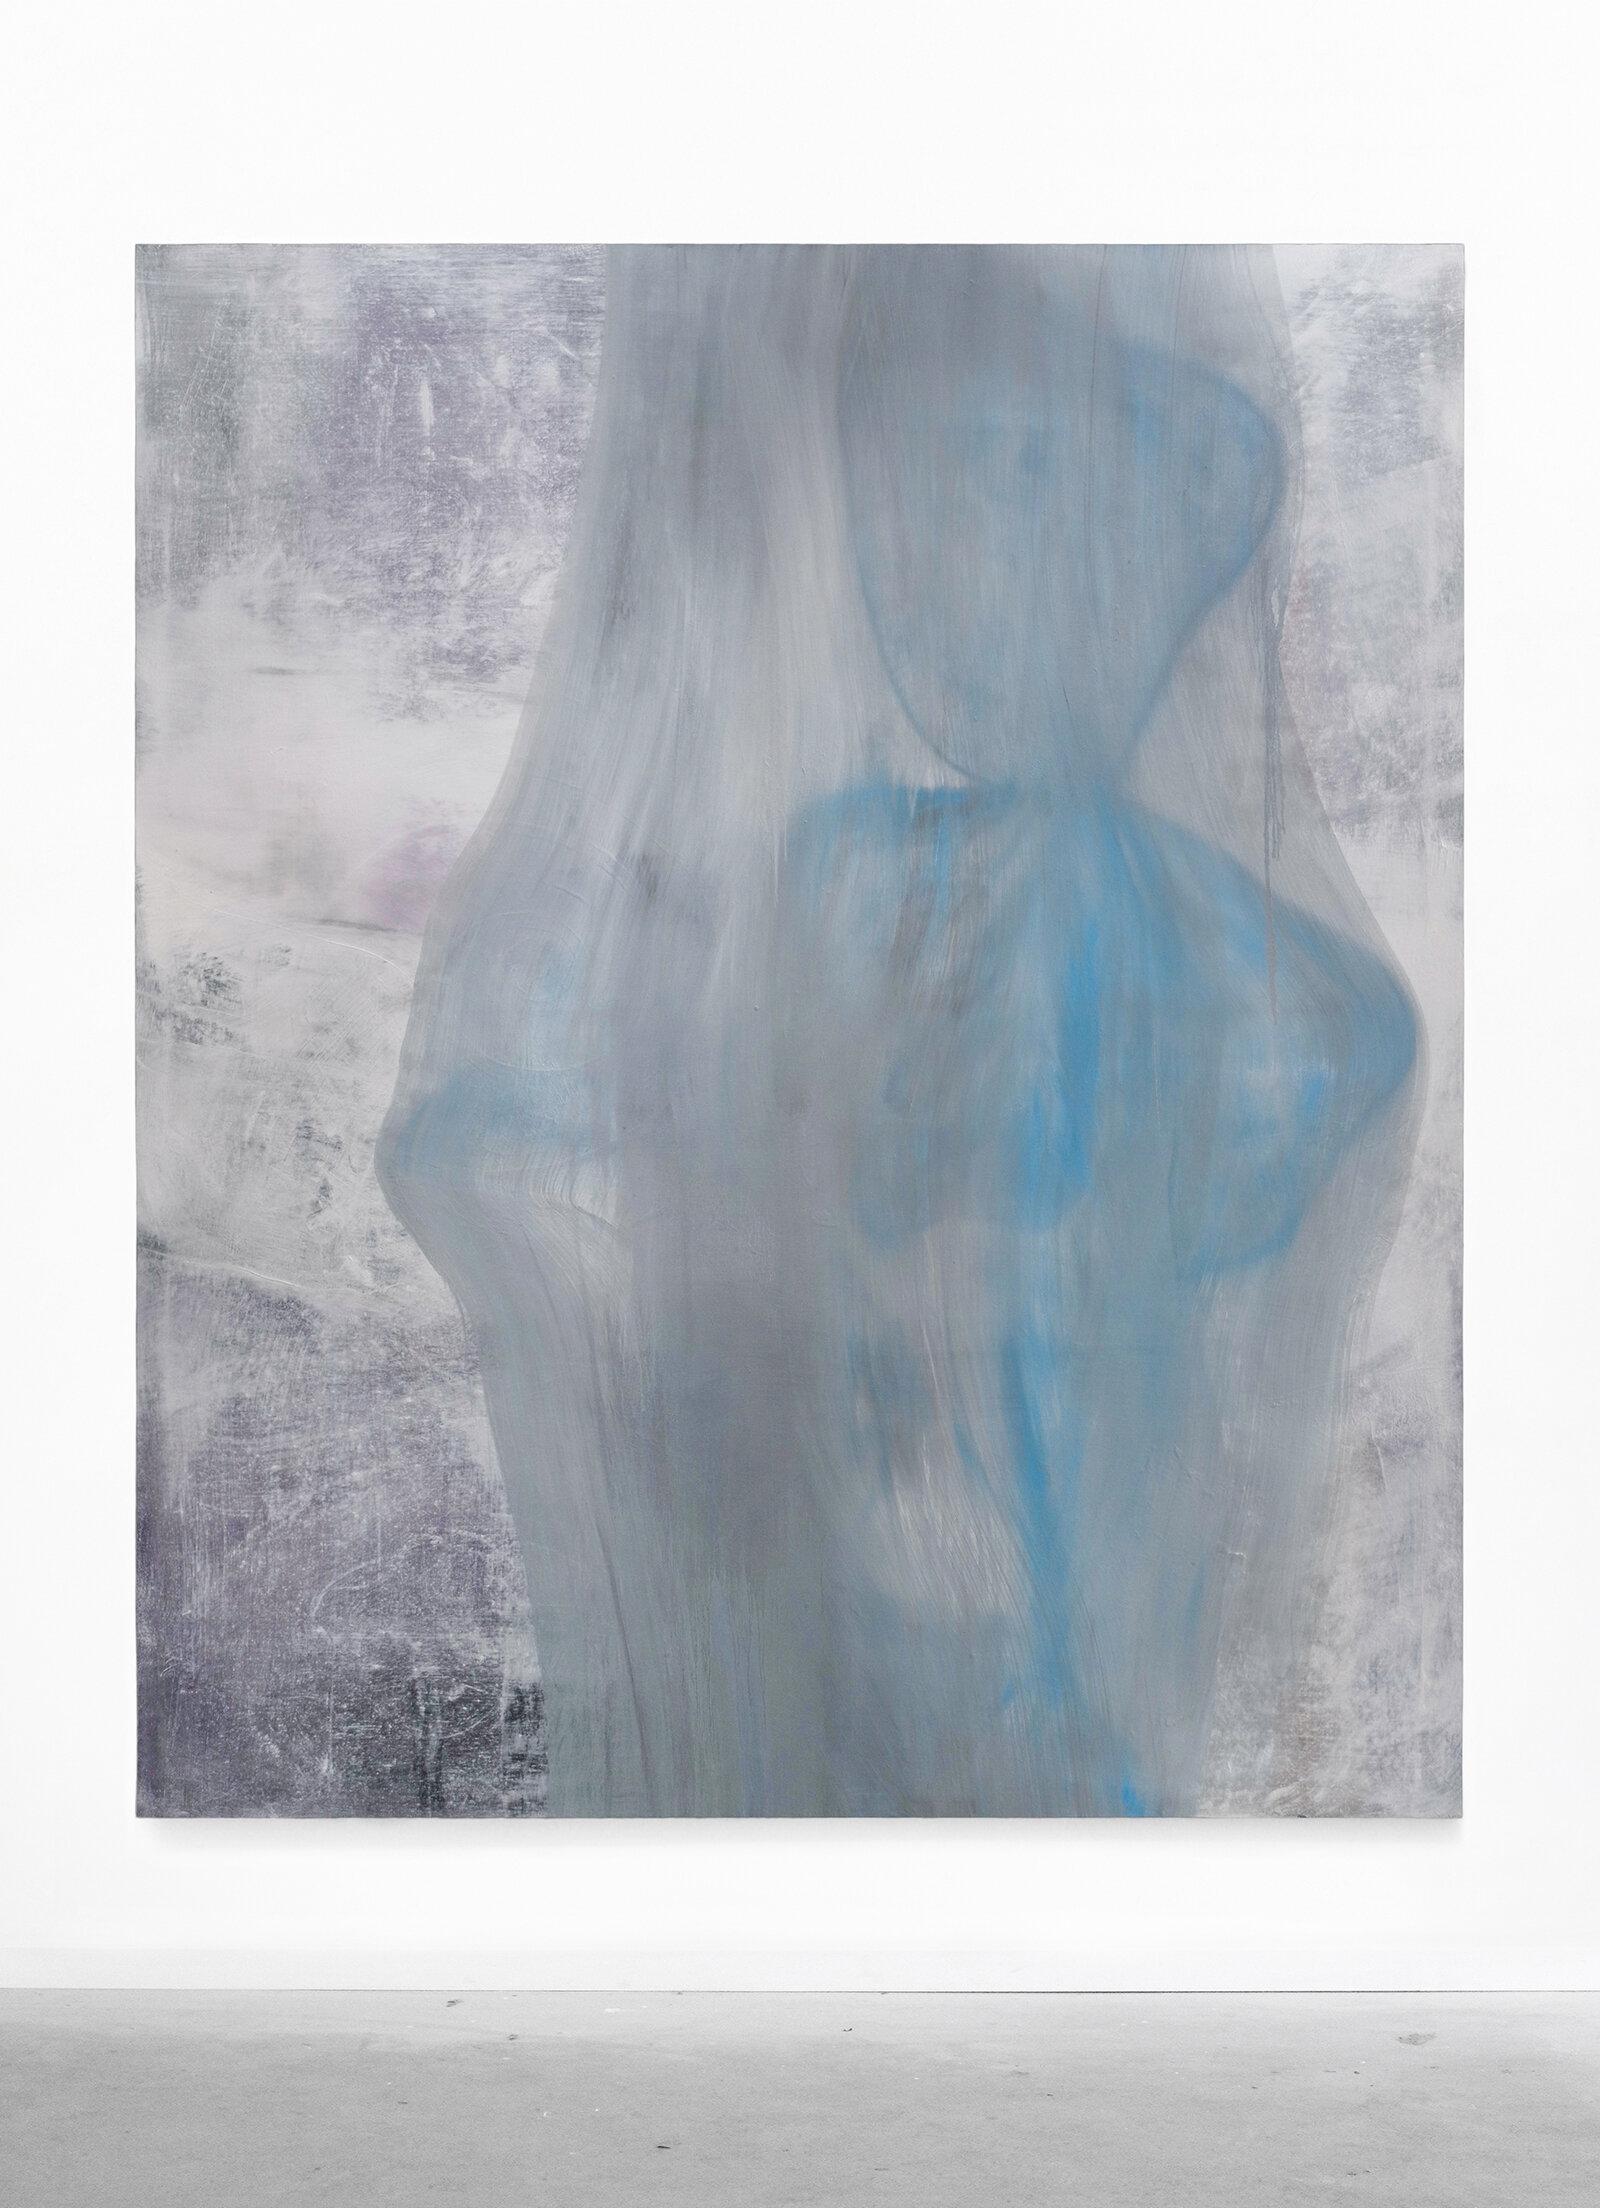 Sonya Derviz, Flower and Mushroom, 2019